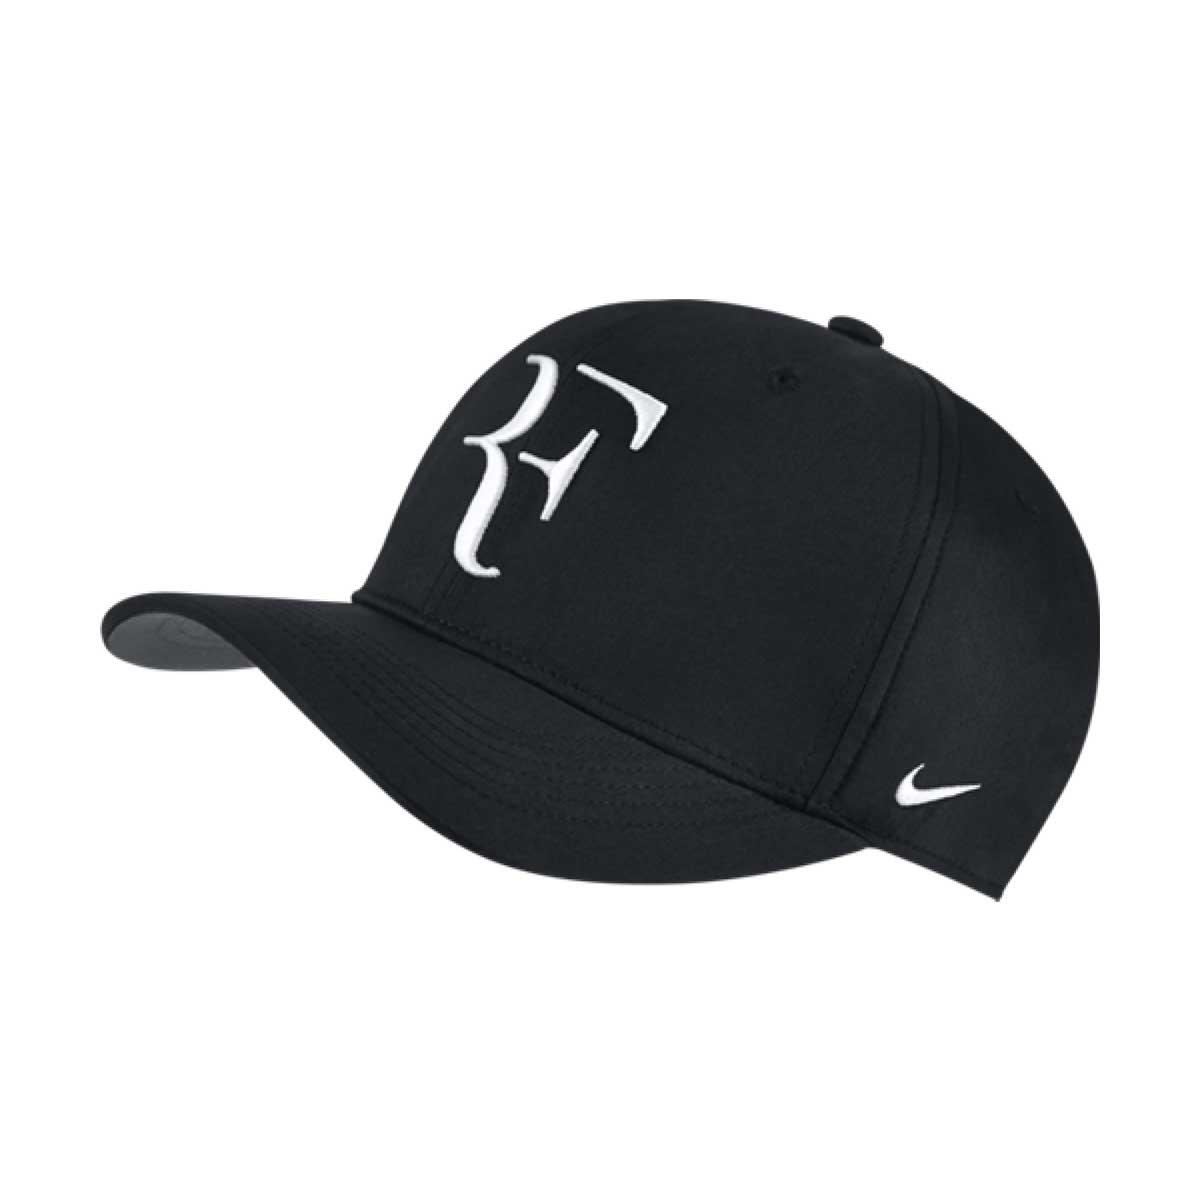 Buy Nike RF Cap Online India 375c372eda2